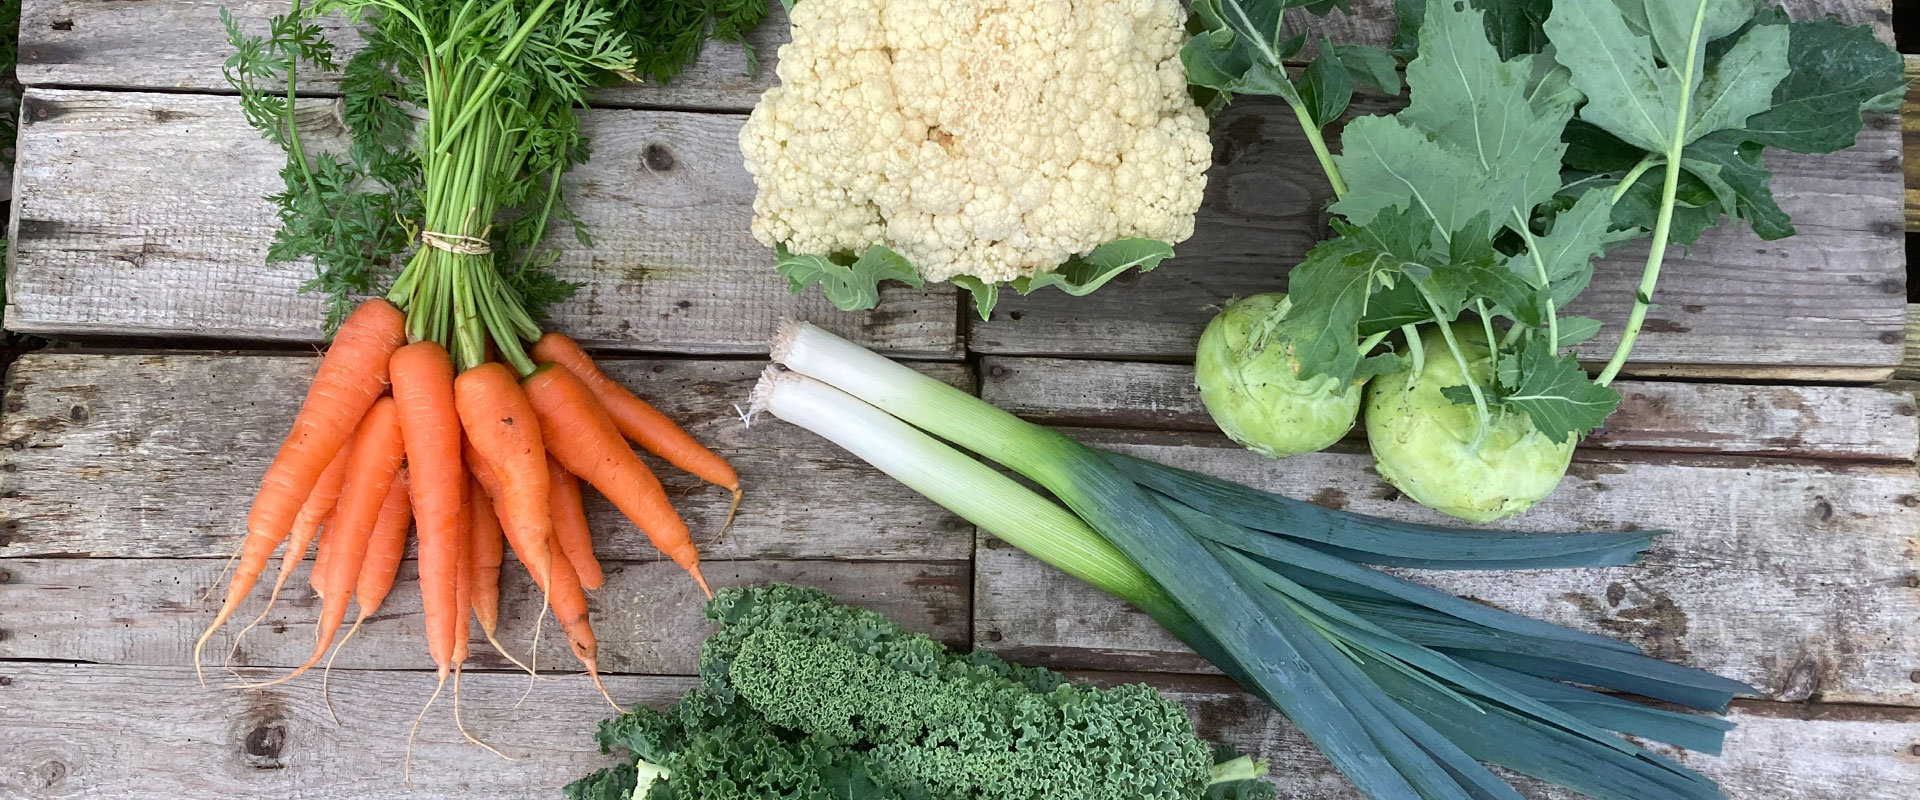 Porree, Karotten, Kohlrabi, Blumenkohl und Grünkohl